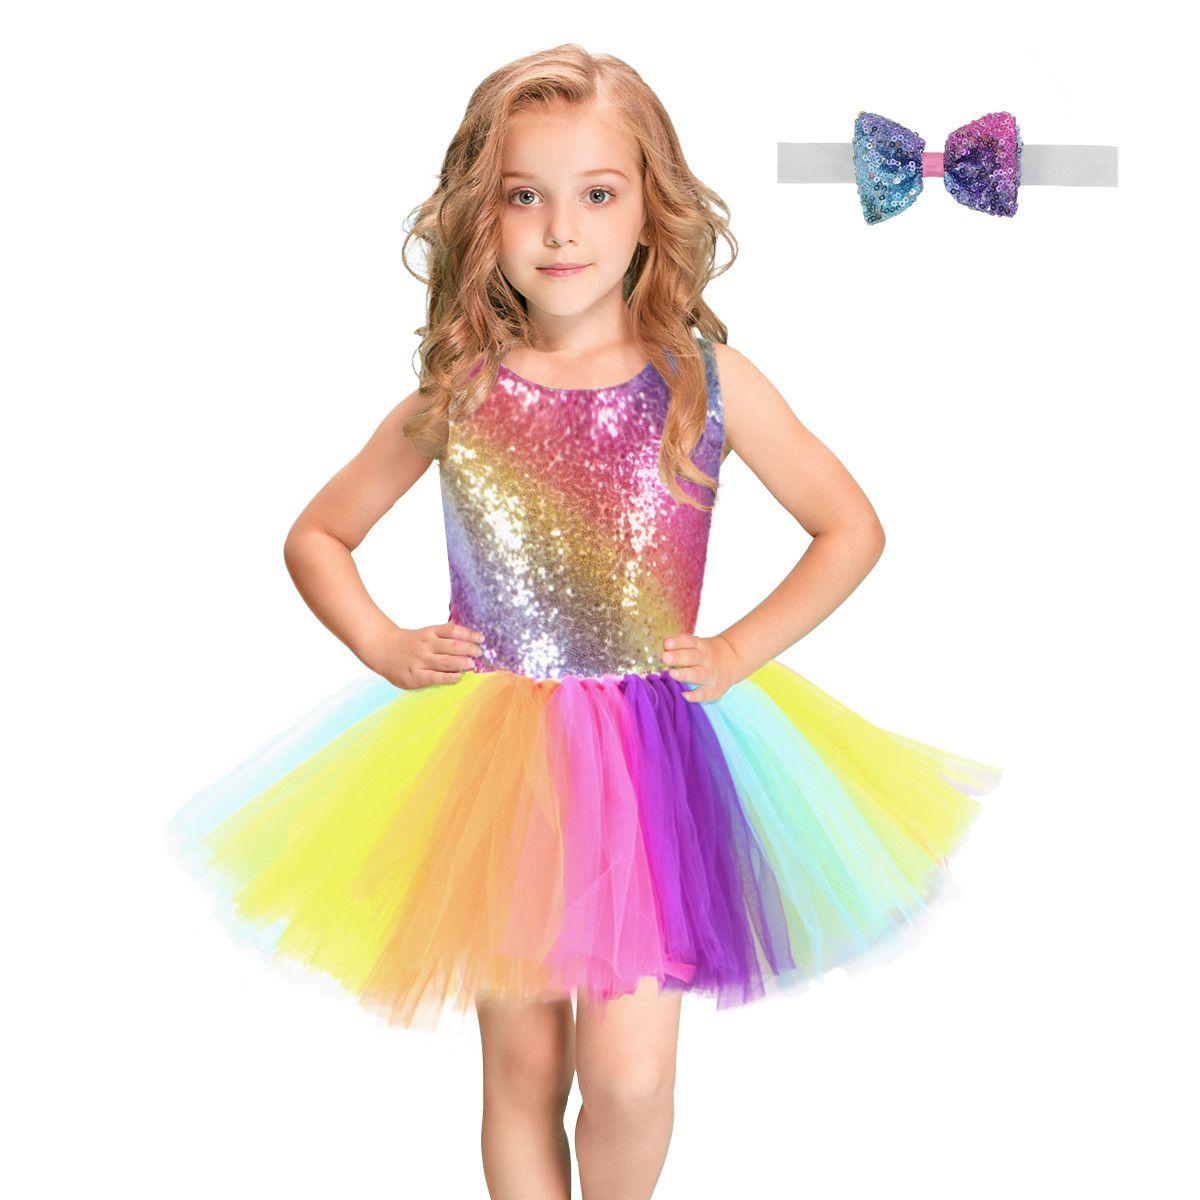 high quality Tutu Rainbow Sequined Girl Dress With Bow Headband Sleeveless Backless Designer Girl Birthday Wedding Party Dresses Sundress Ve